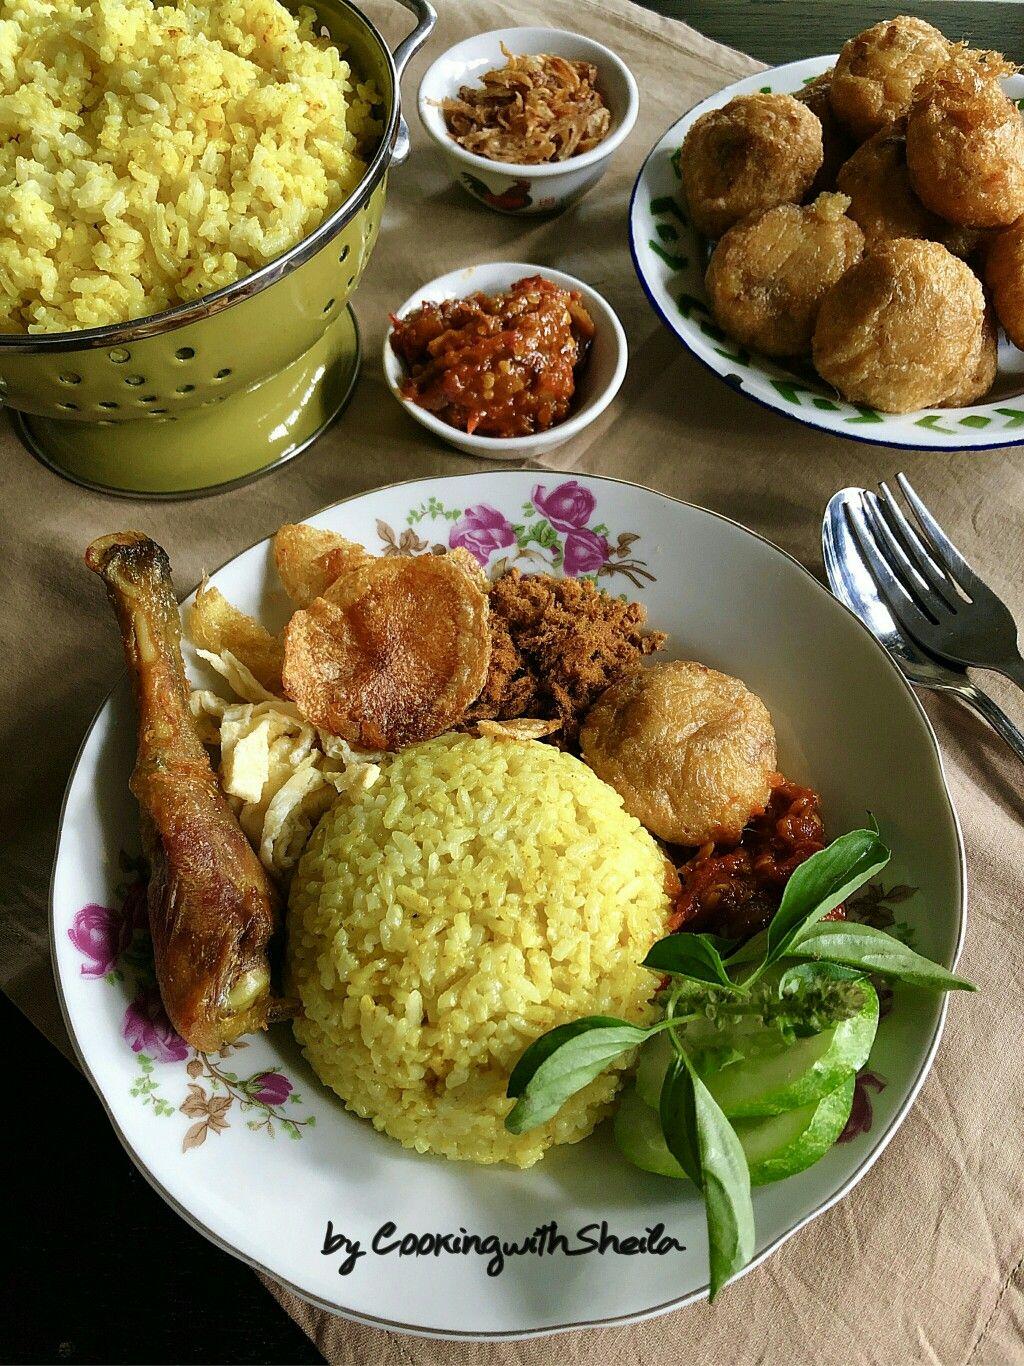 Nasi Kuning Rice Cooker : kuning, cooker, Kuning, Cooker, Resep, Masakan, Malaysia,, Indonesia,, Memasak